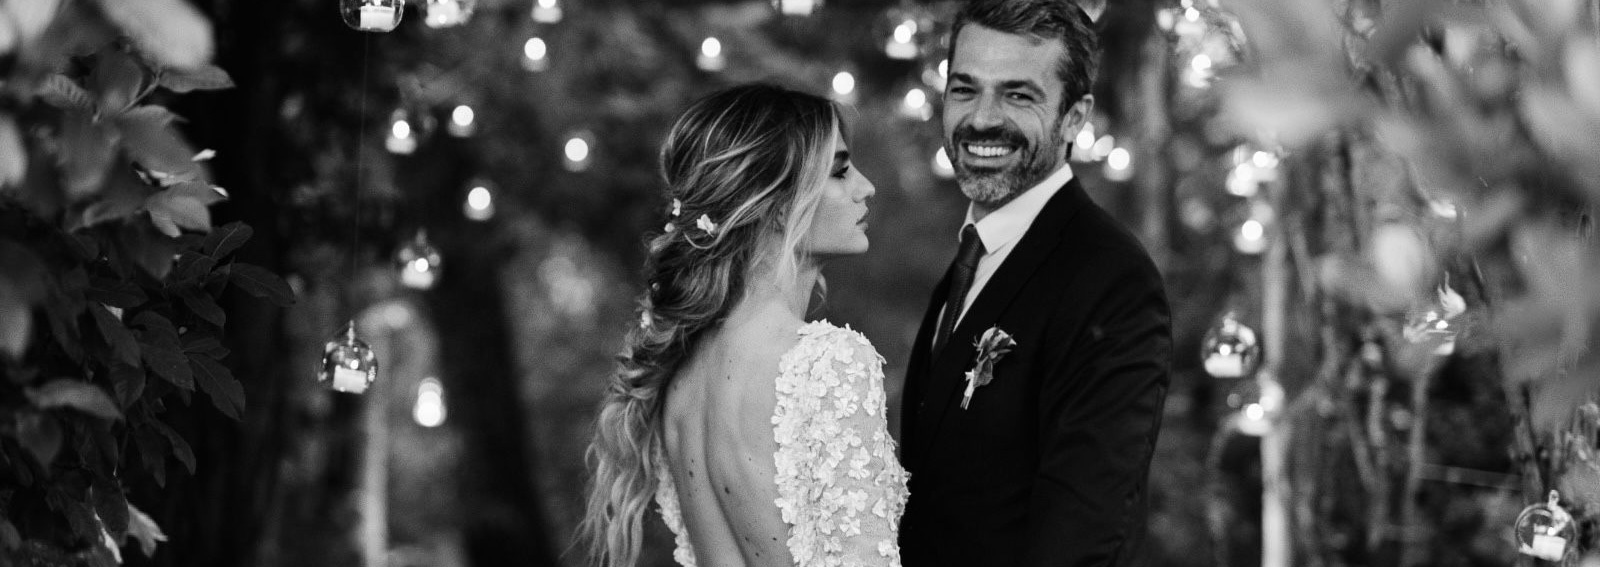 cover-luca-argentero-wedding